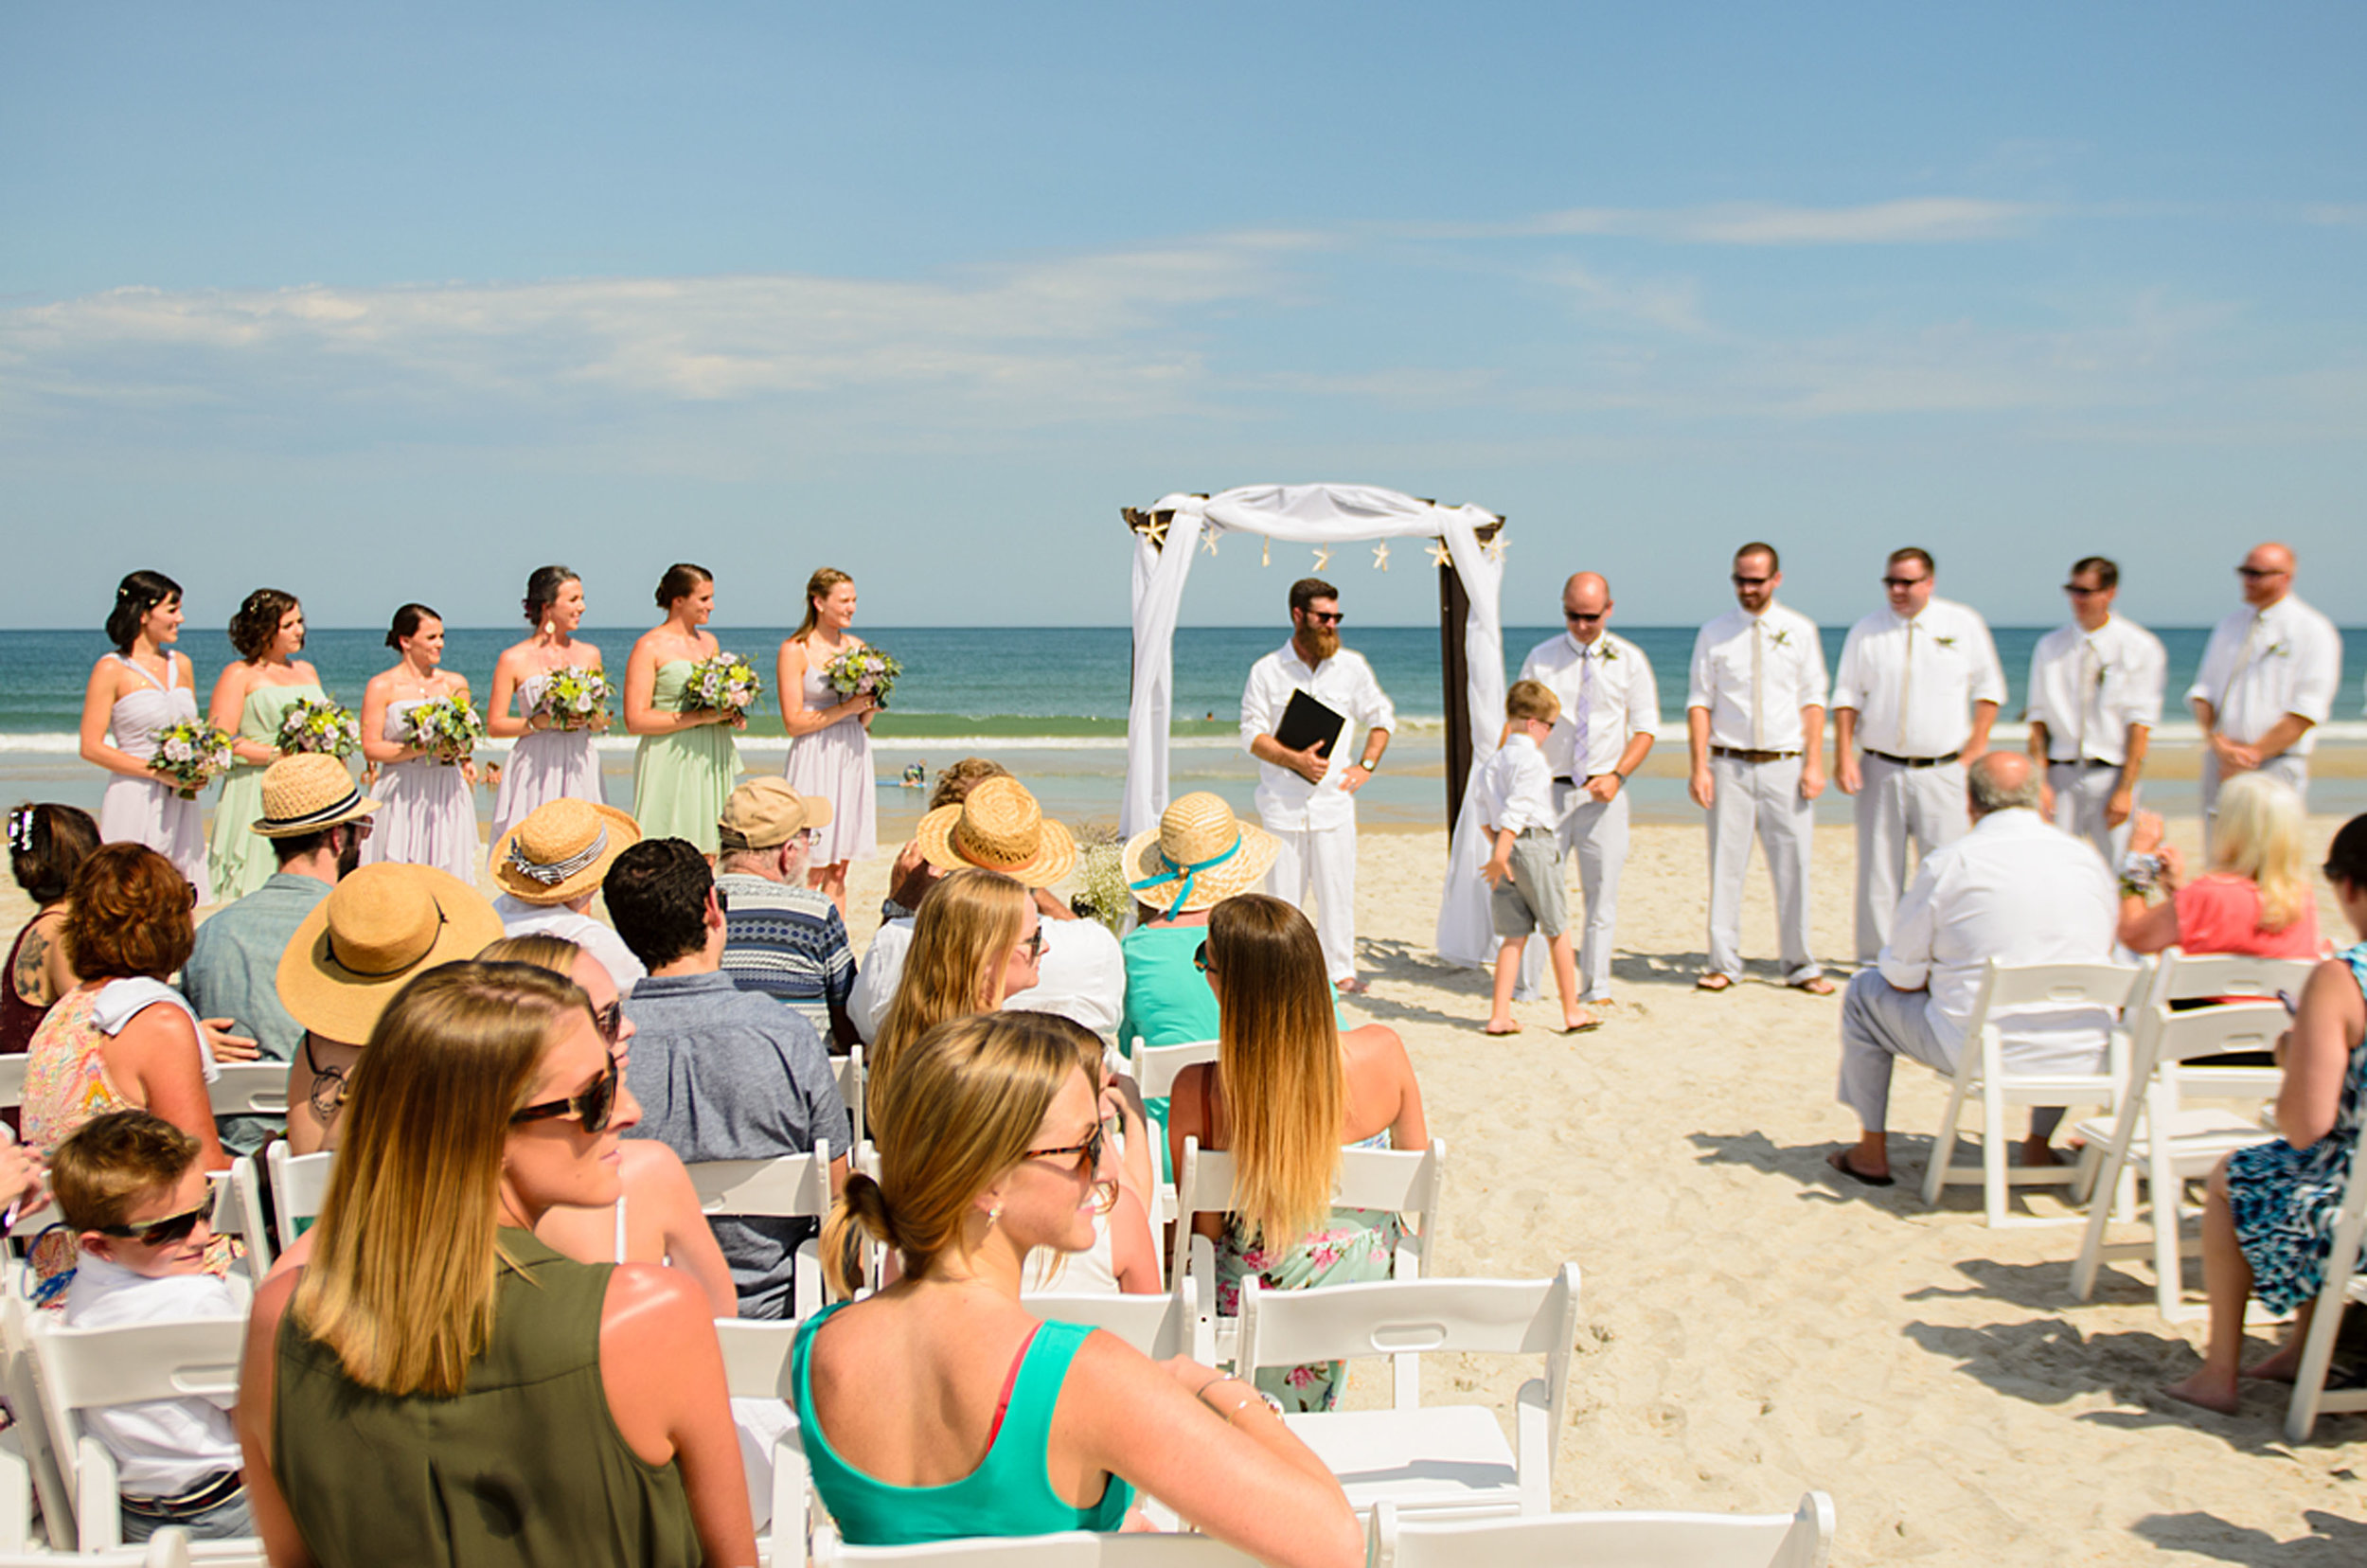 North_Carolina_Wedding_Photographer_Tiffany_Abruzzo_Ceremony_14.6.jpg